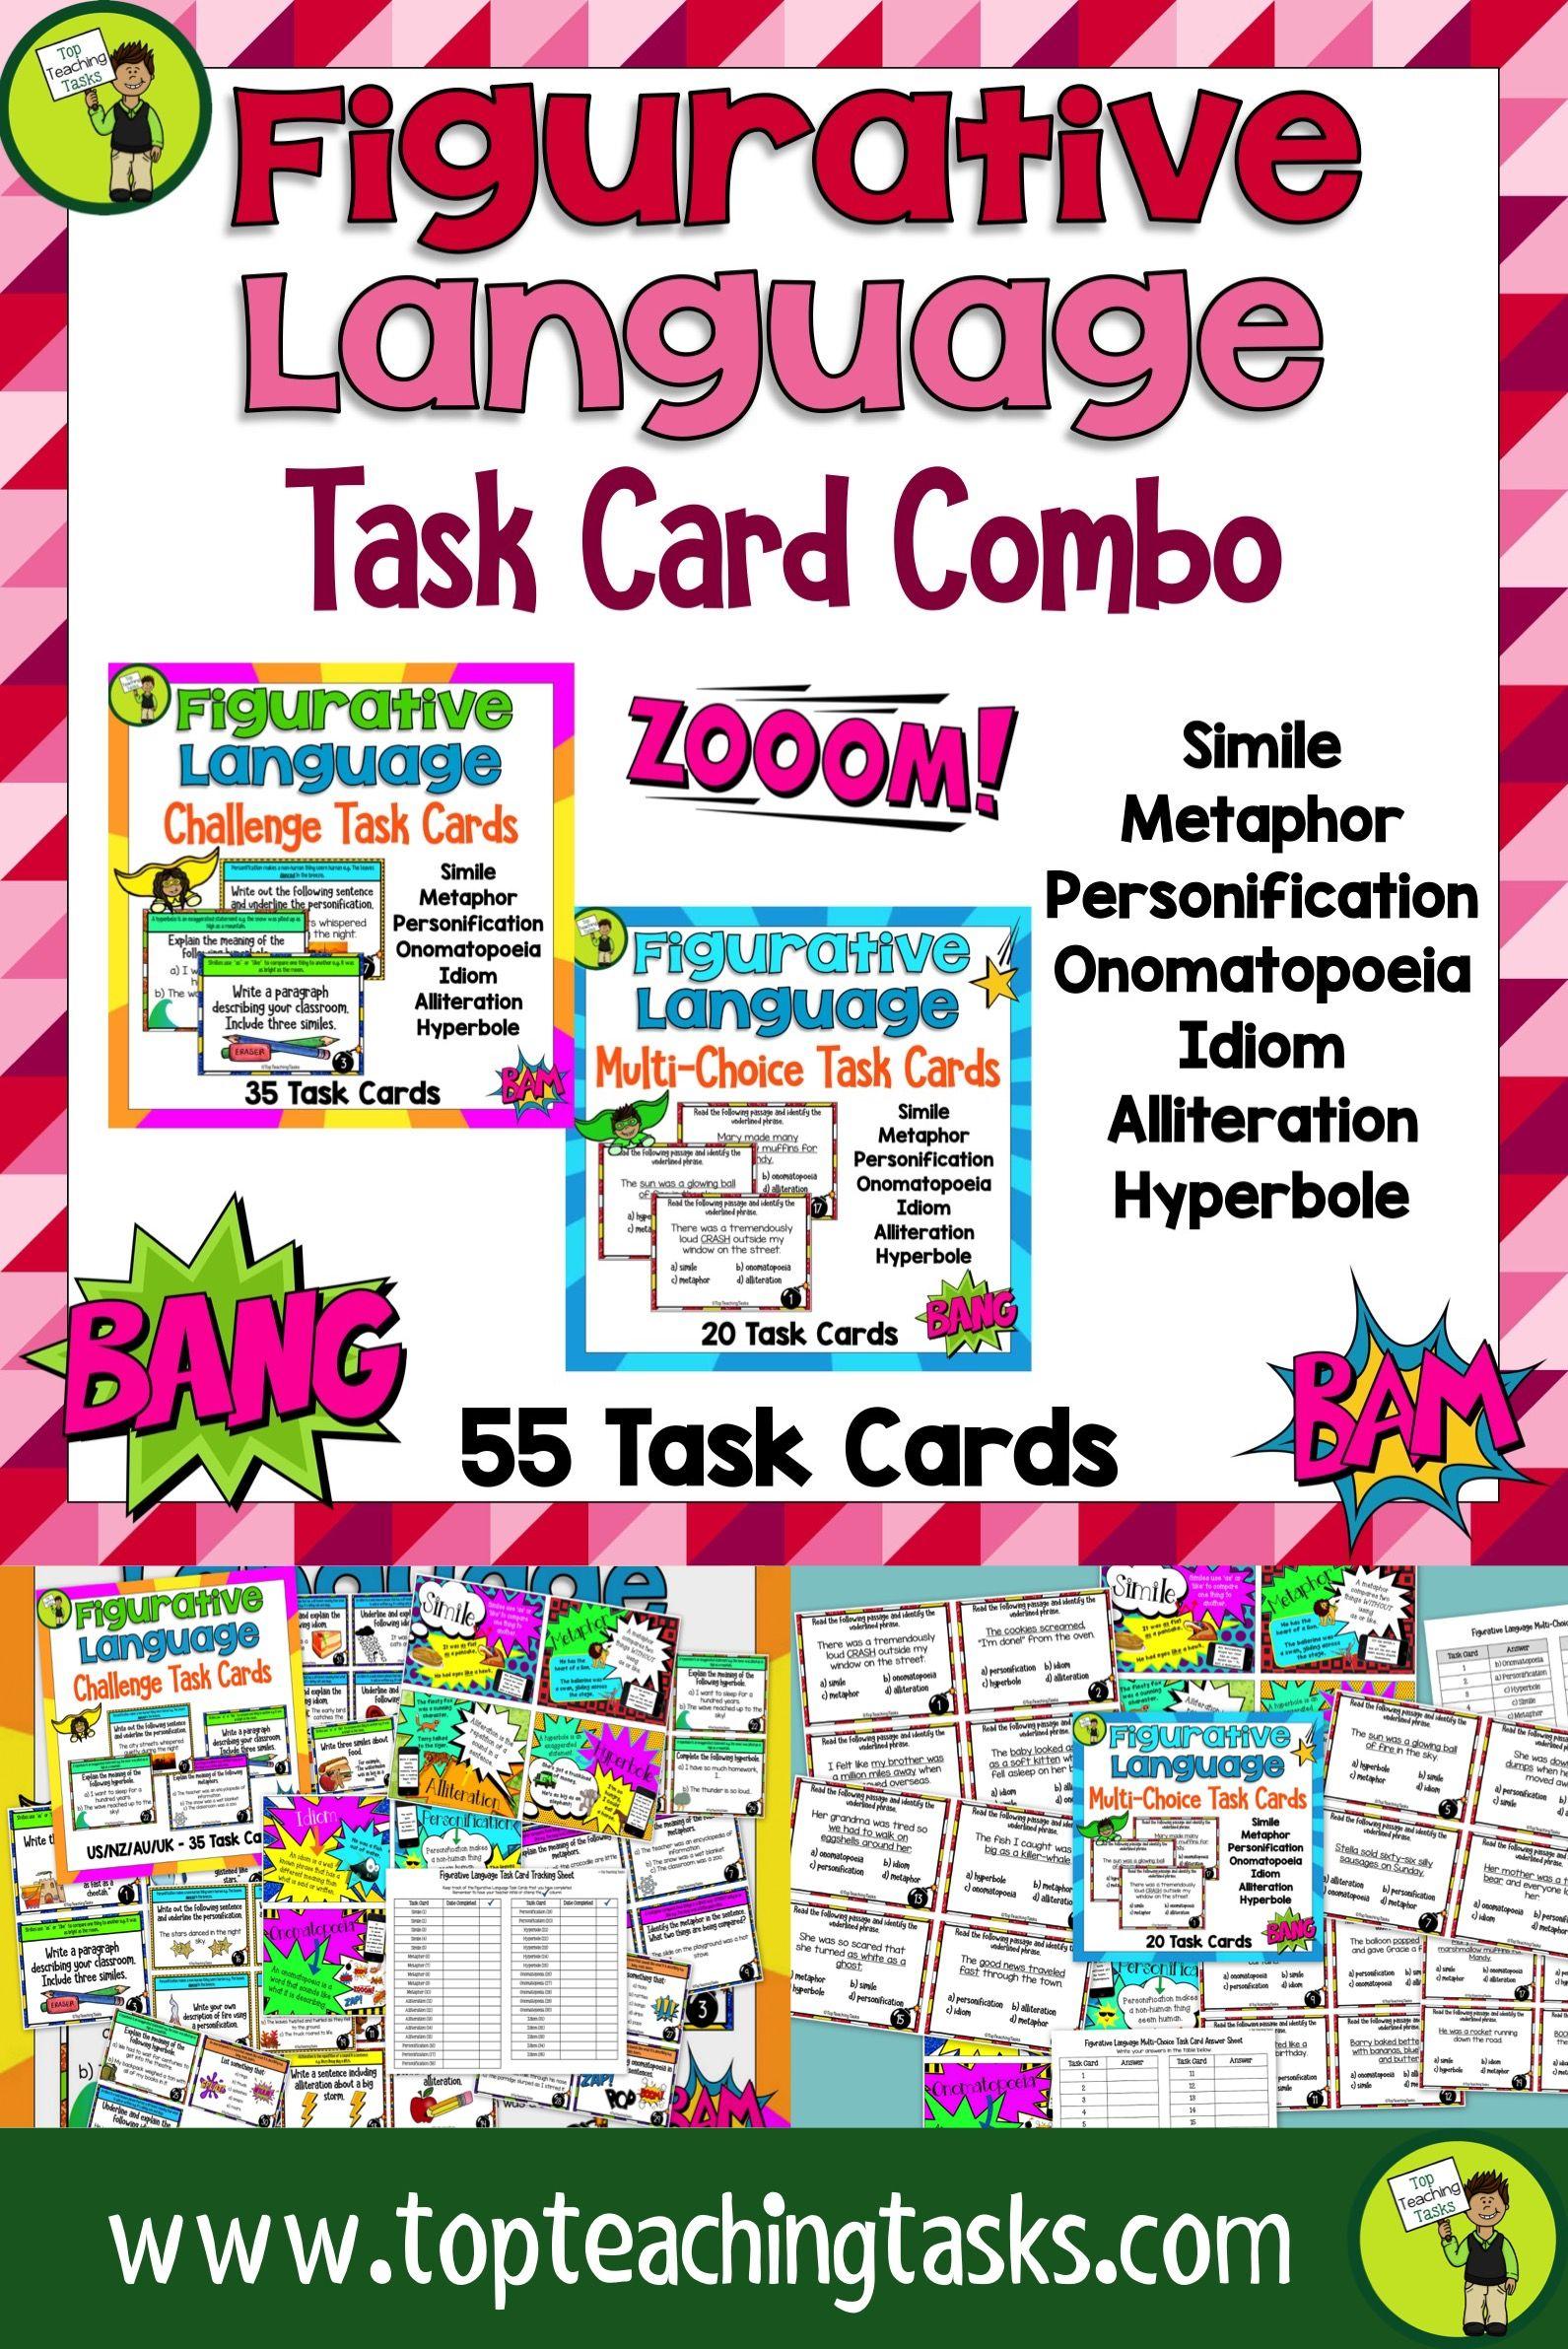 Figurative Language Challenge Task Cards Combo